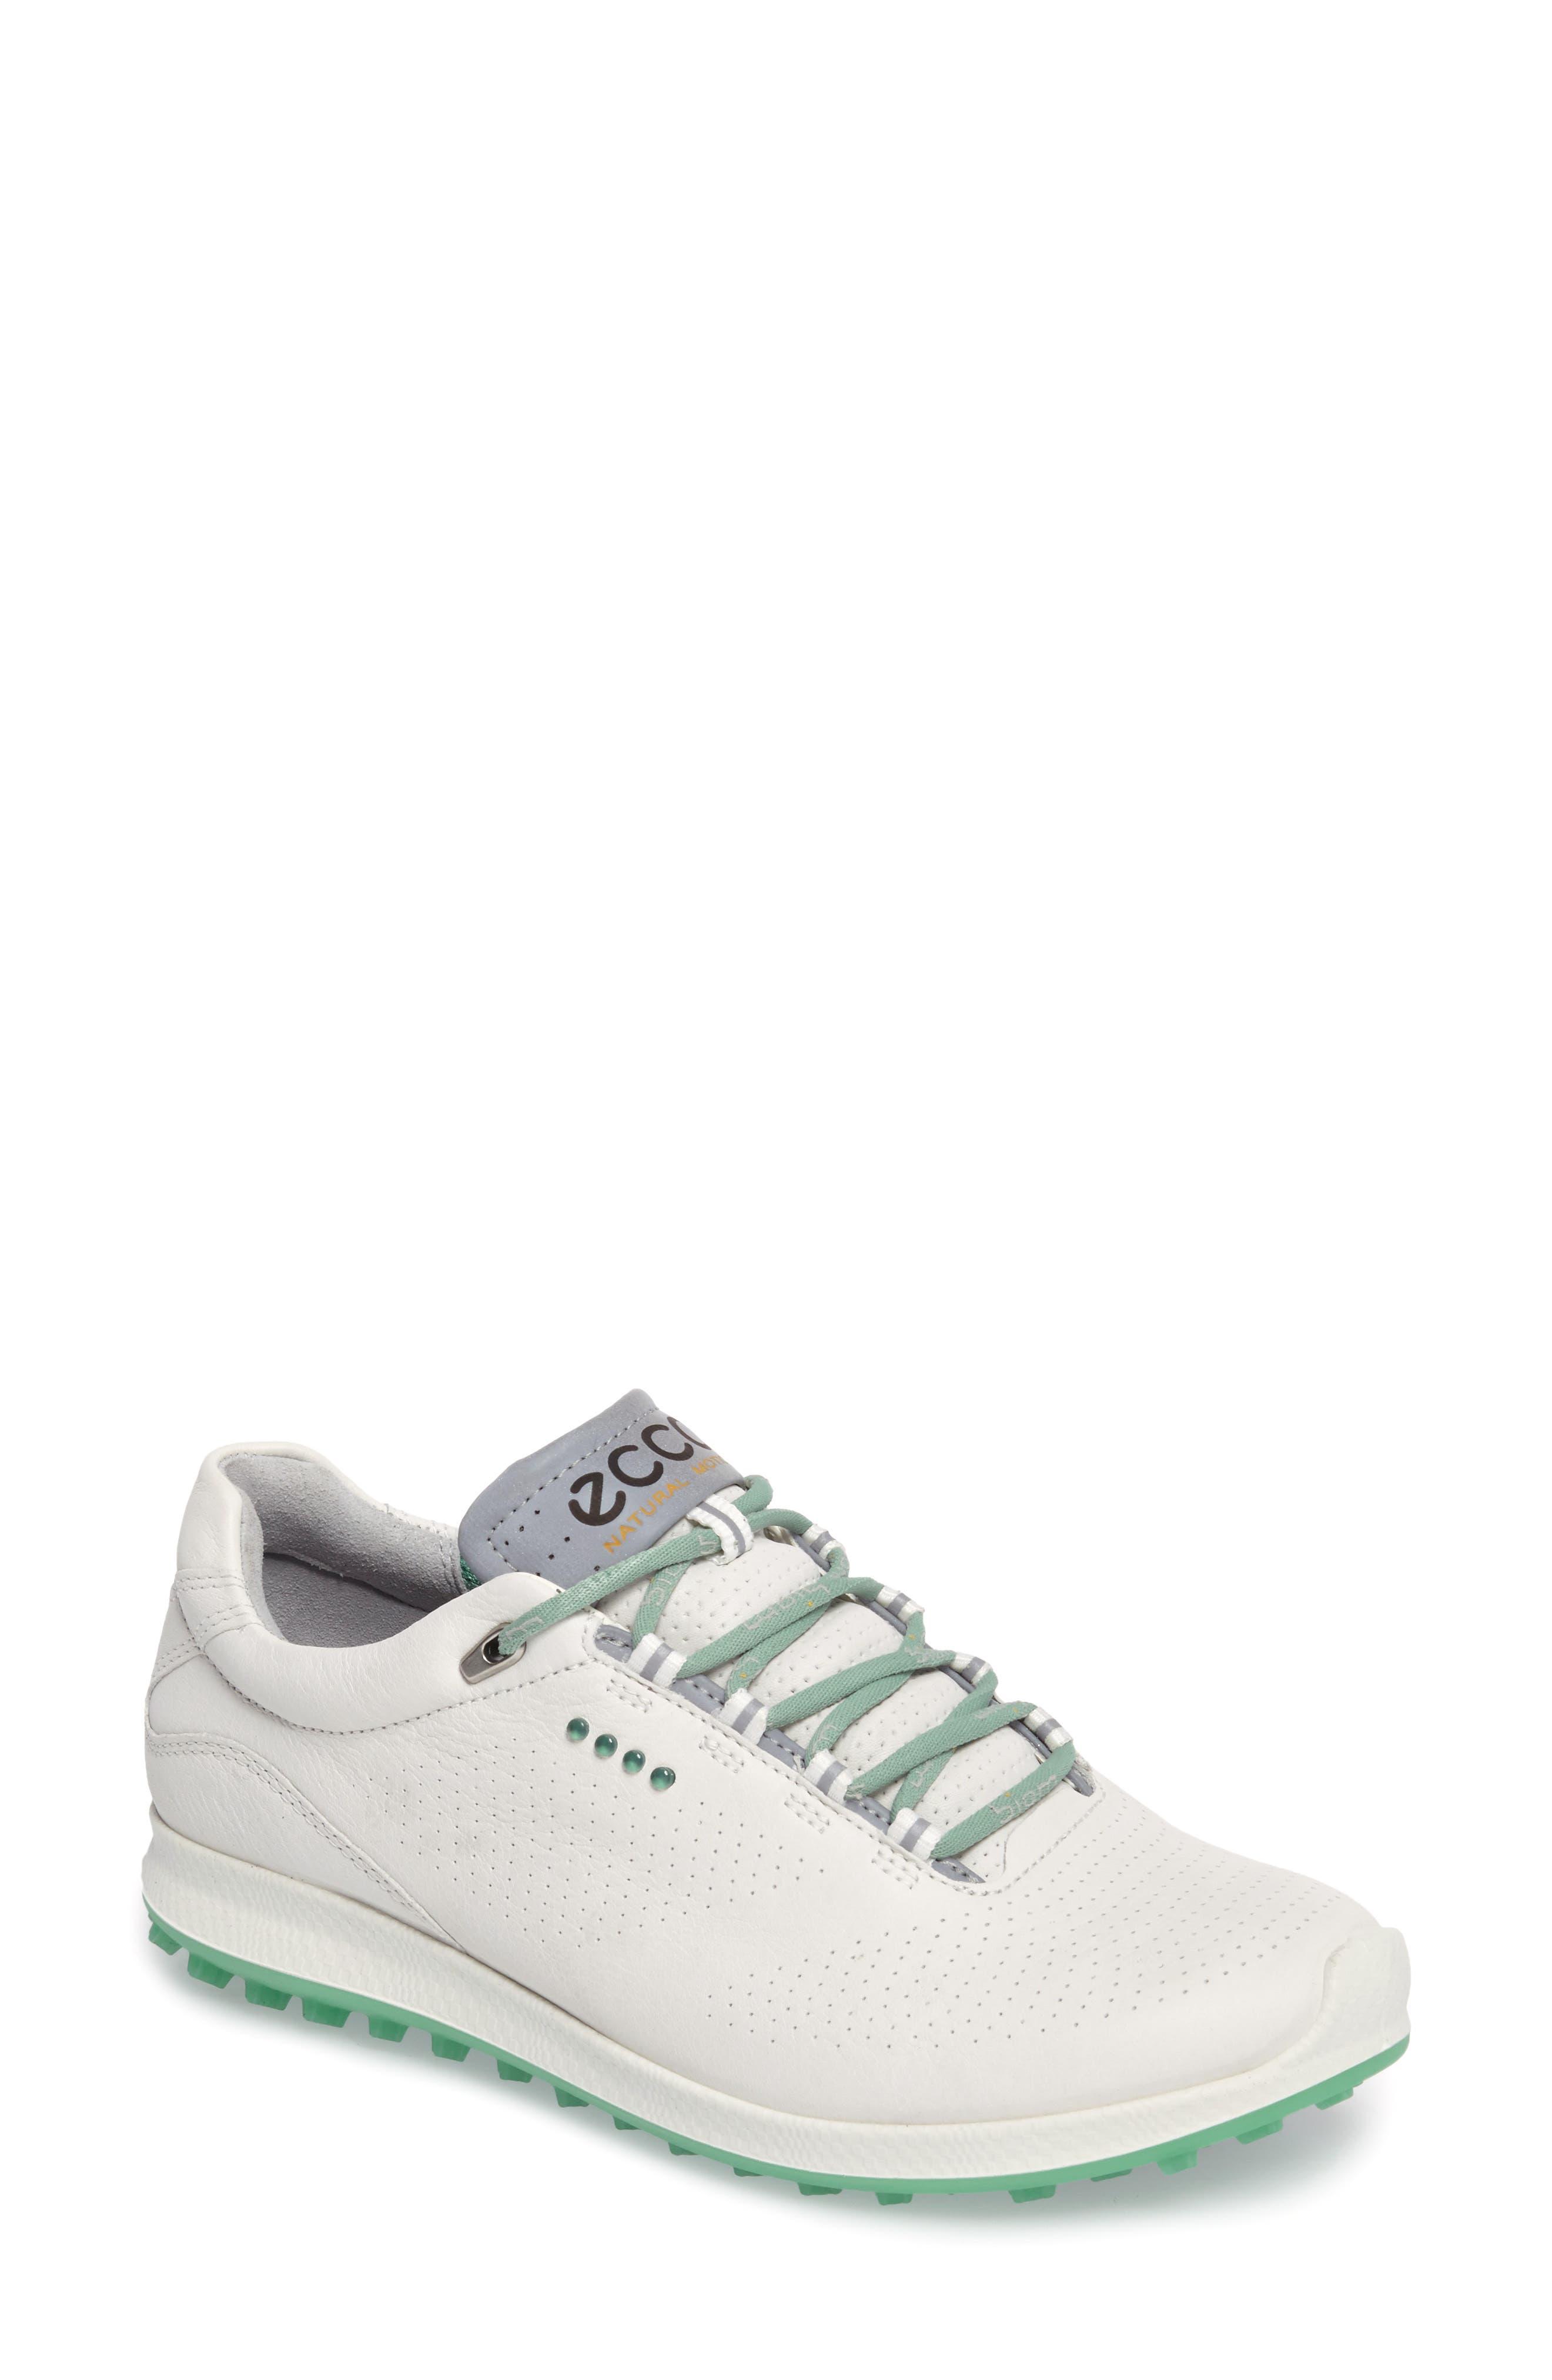 BIOM 2 Hybrid Water-Repellent Golf Shoe,                         Main,                         color, WHITE/ GRANITE GREEN LEATHER